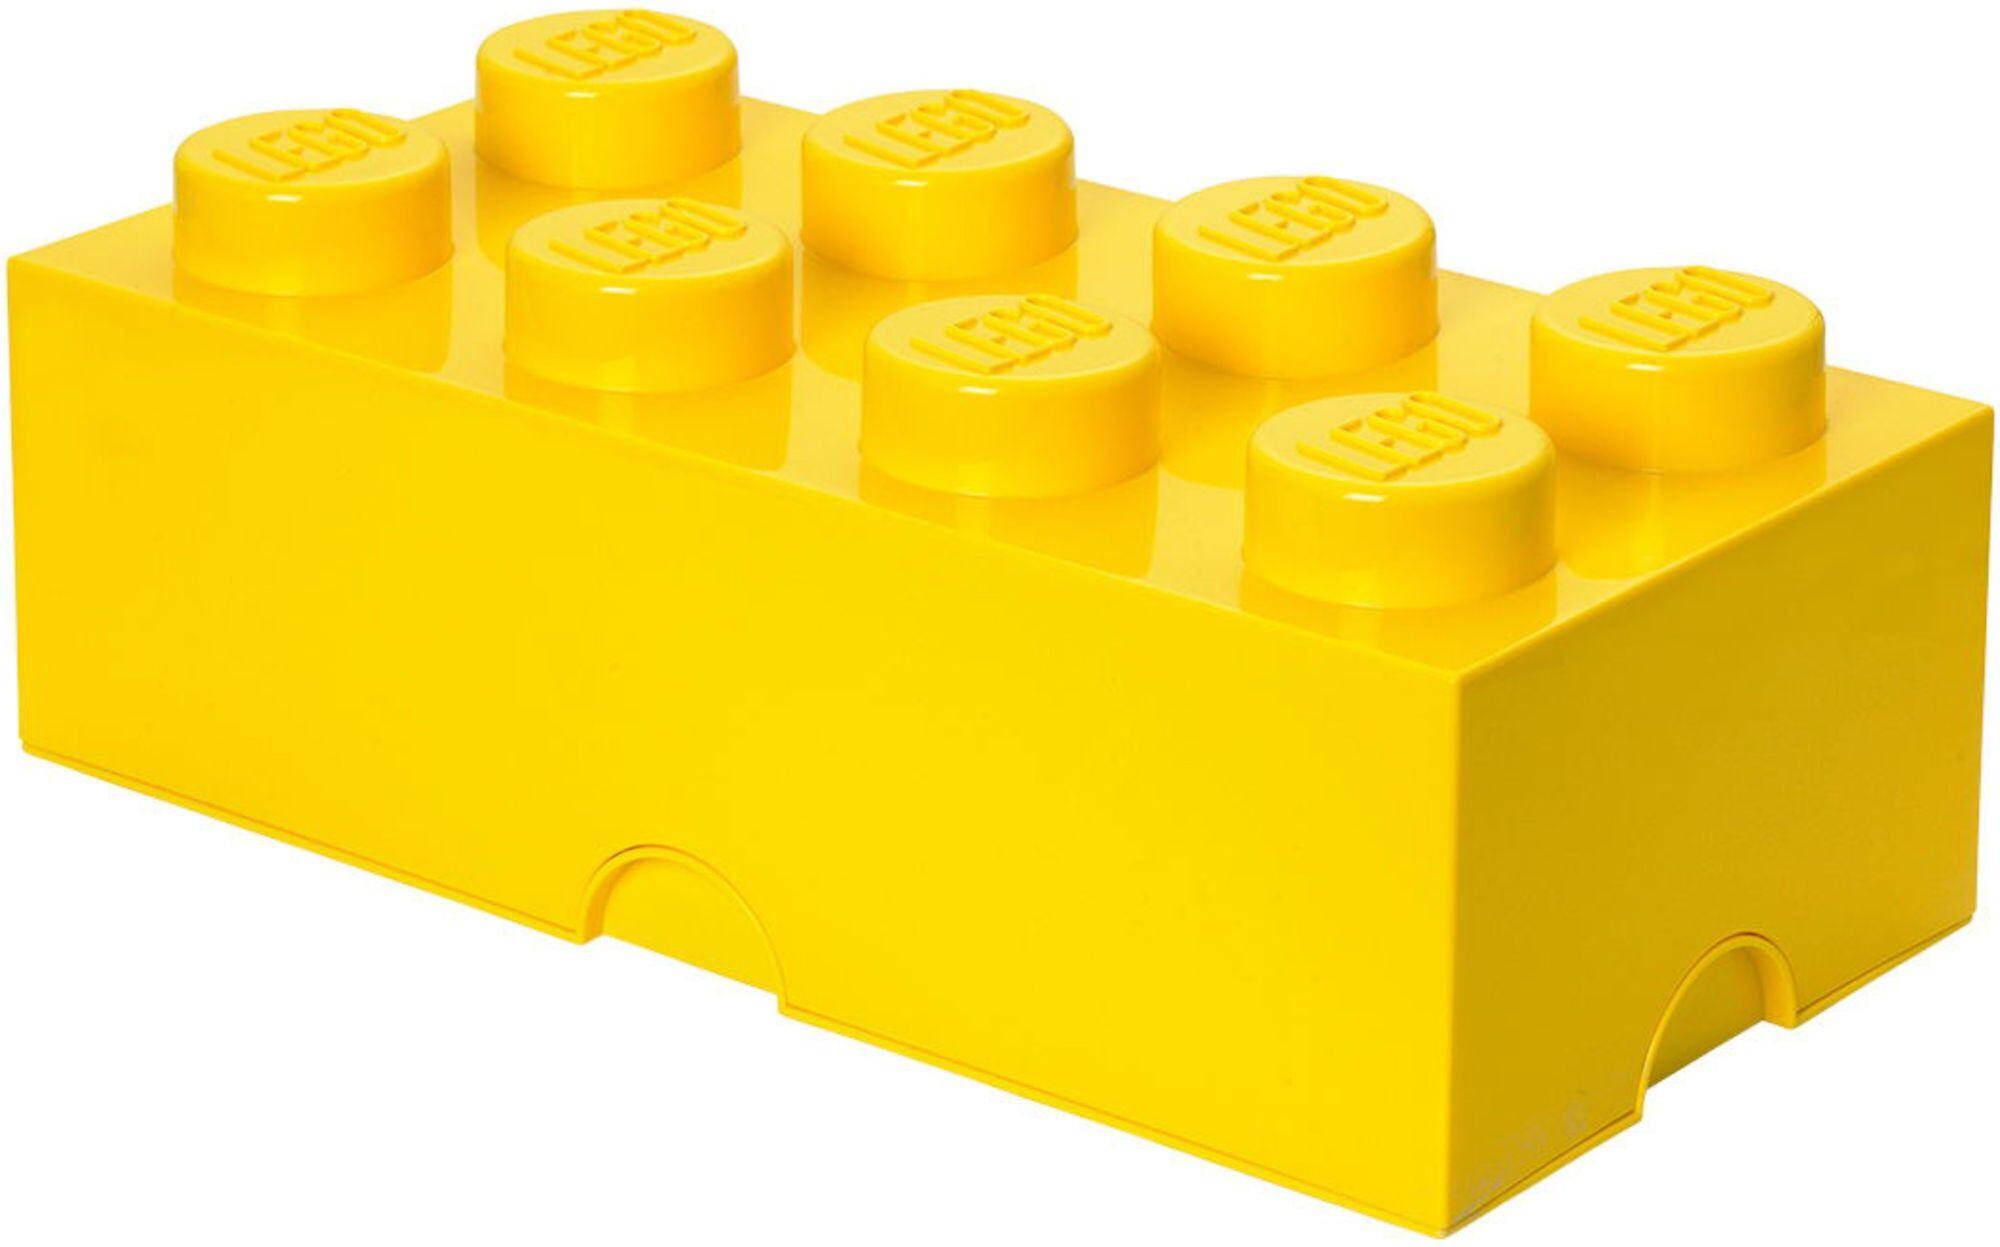 Lego Oppbevaring 8 Gul